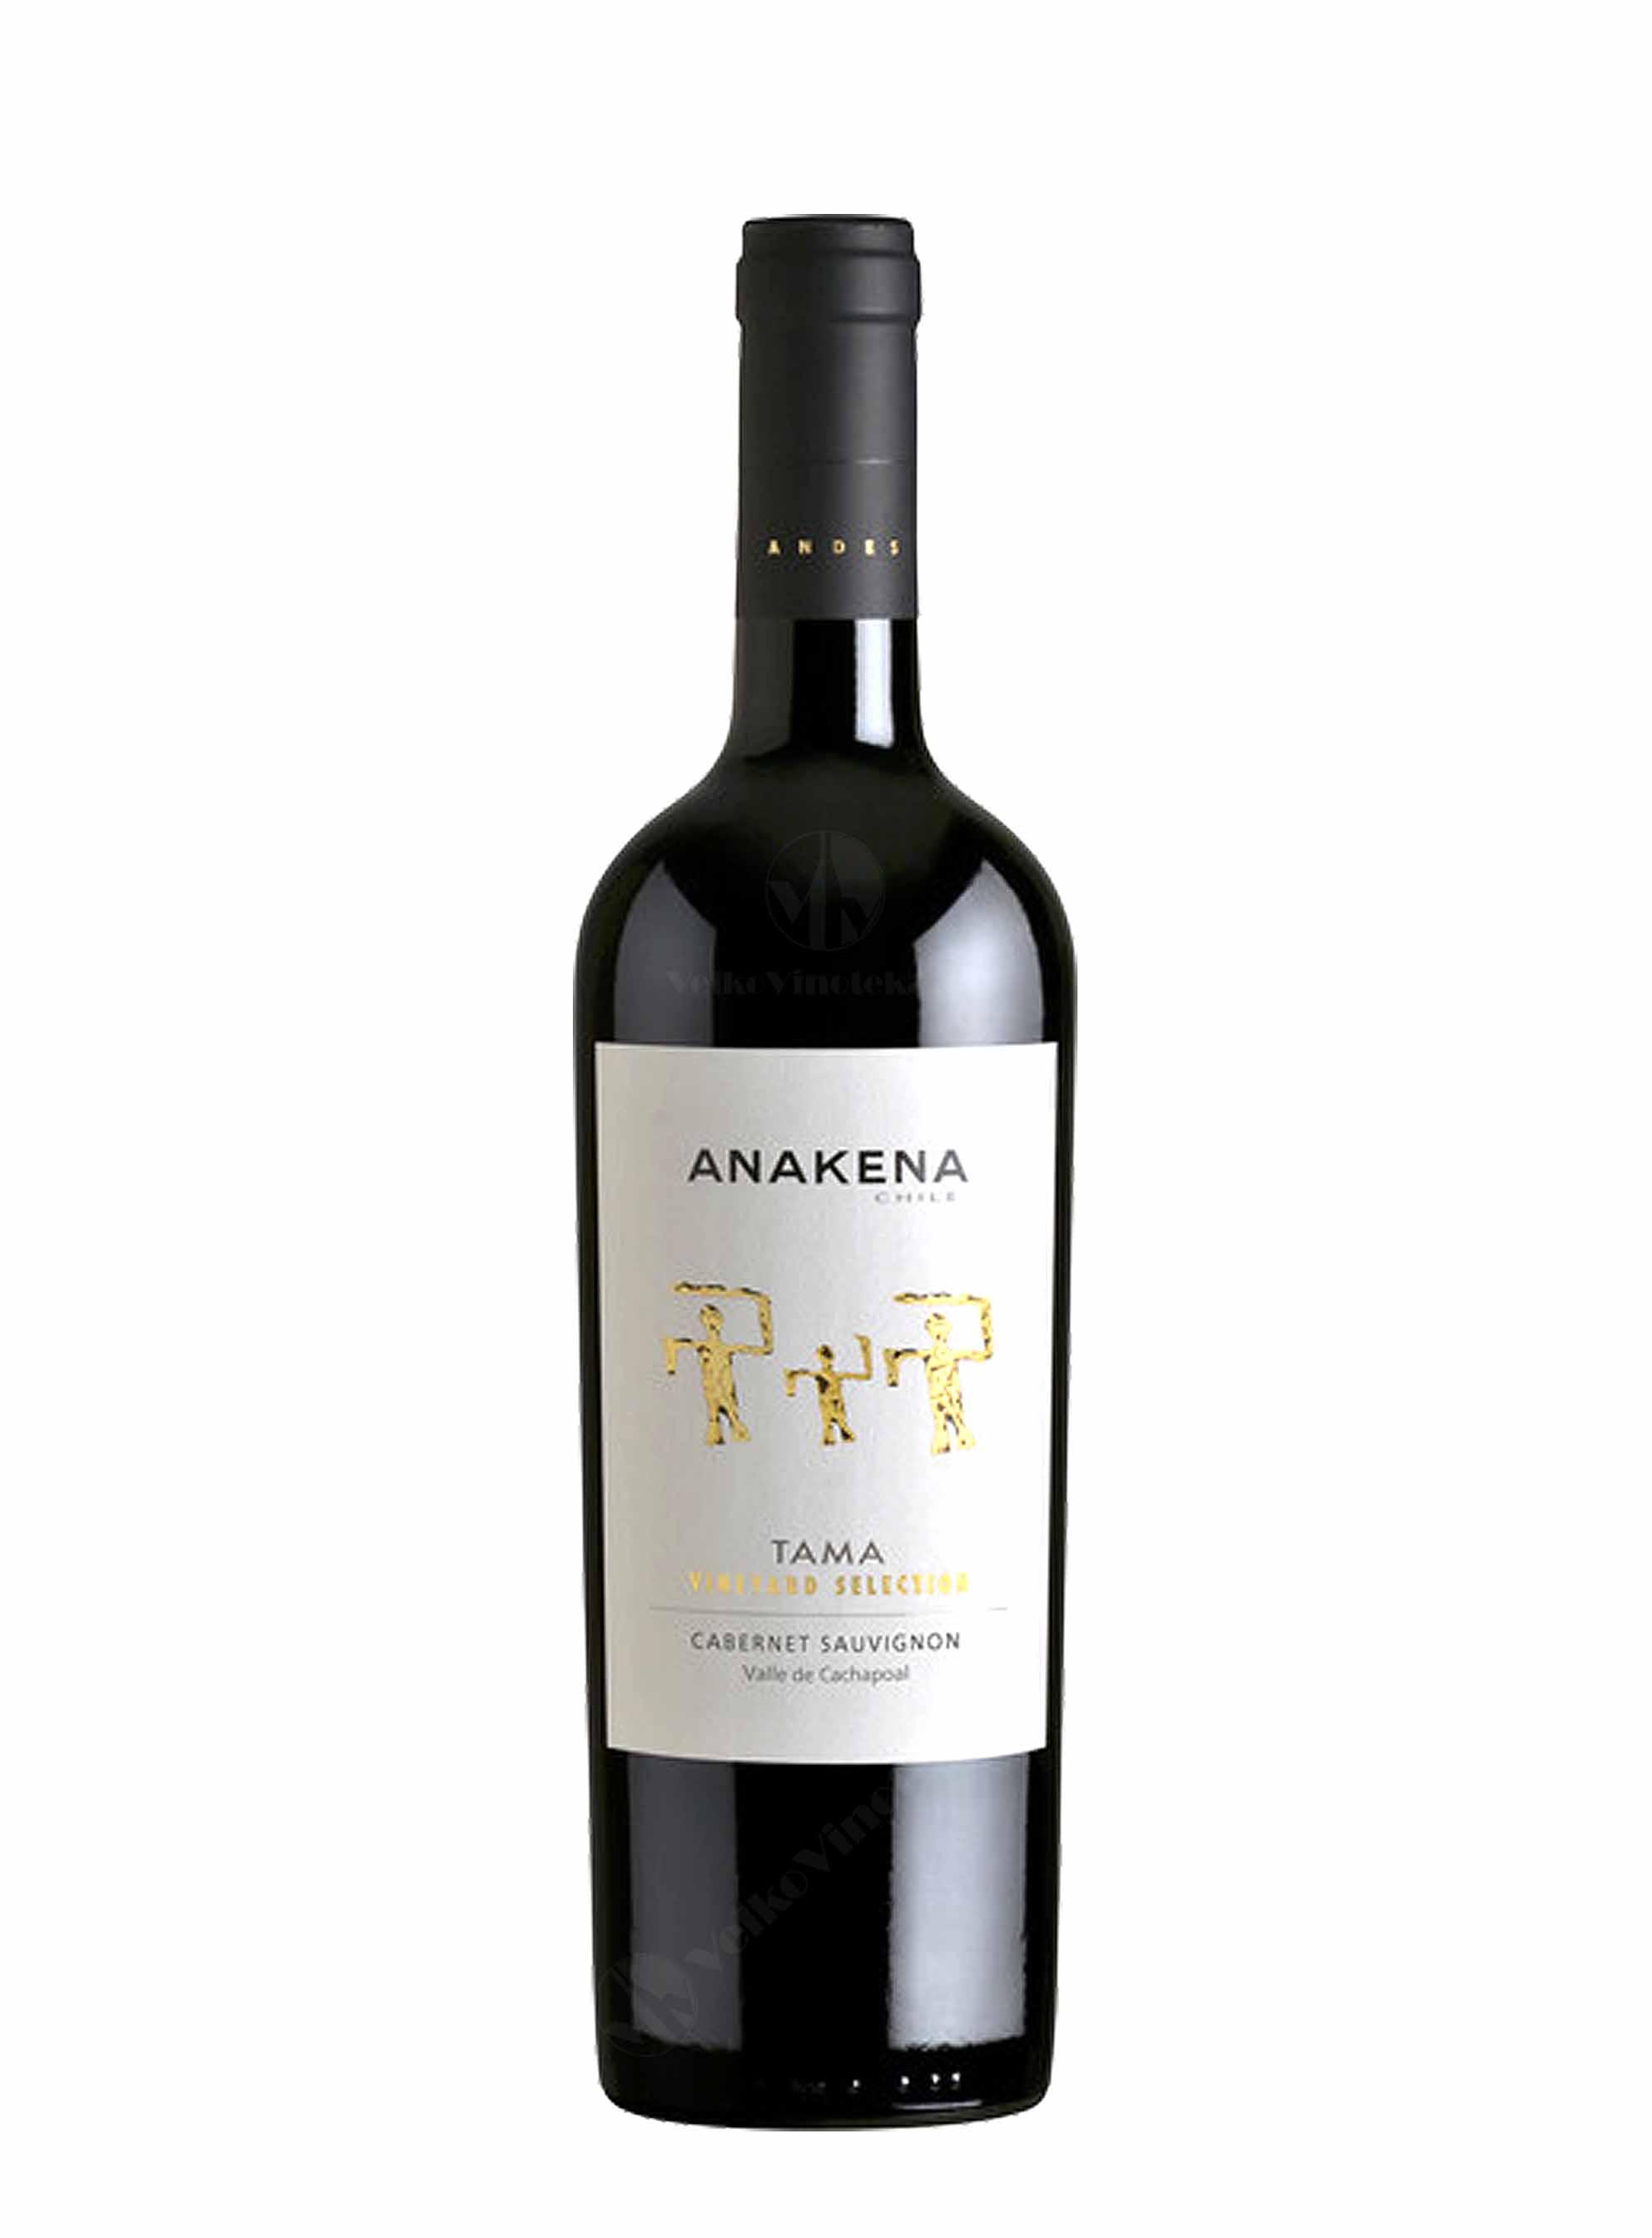 Cabernet Sauvignon, Tama, 2015, Anakena Winery, 0.75 l